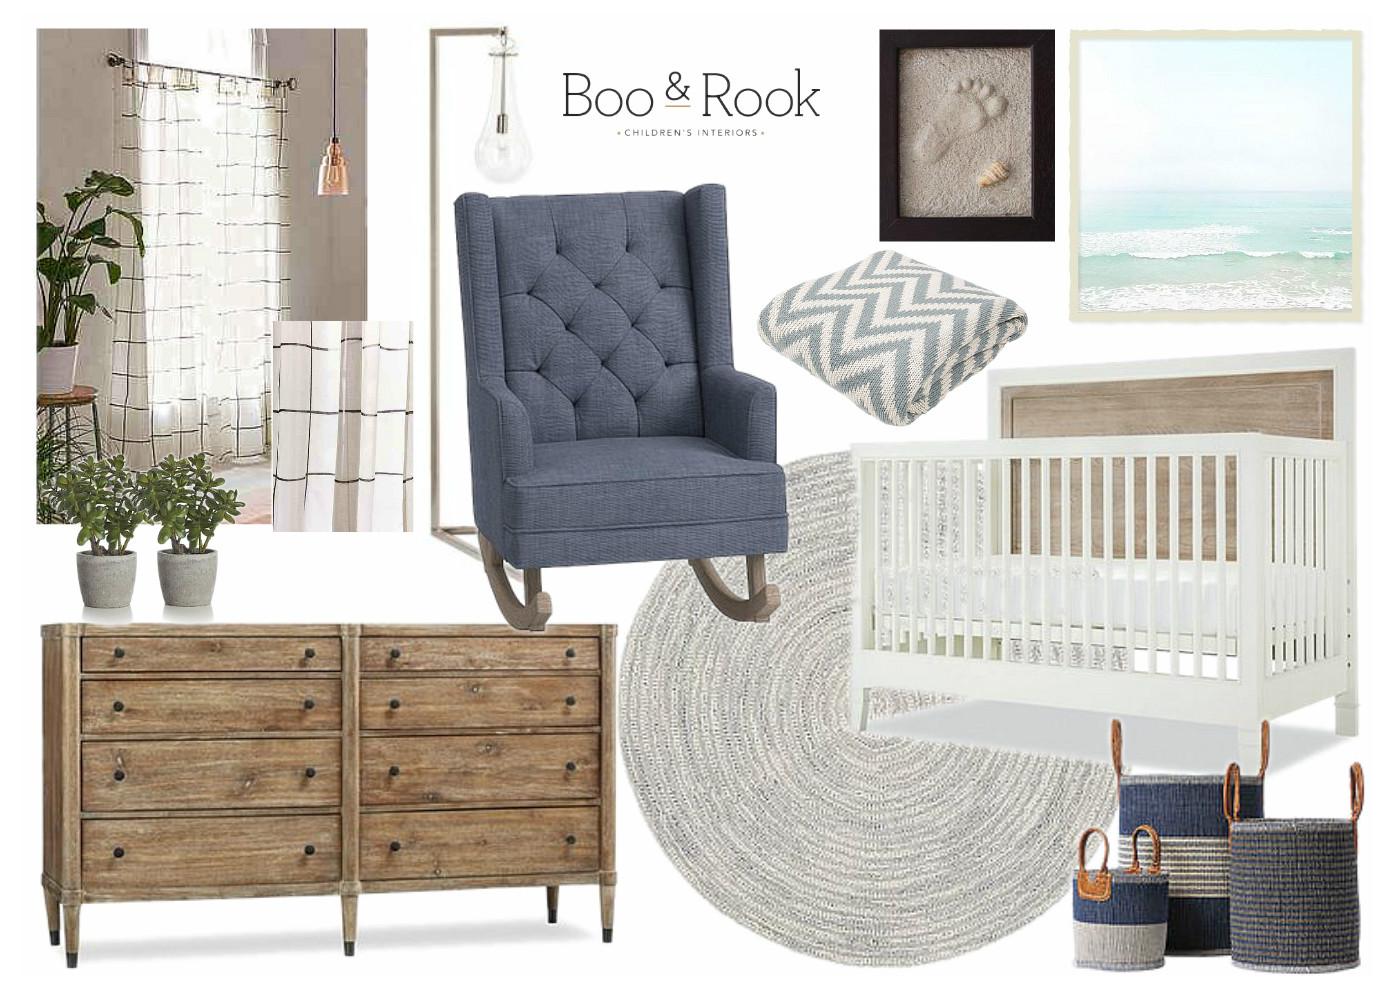 Boo & Rook boston massachusetts interior designer nursery designer baby boy beach modern nursery